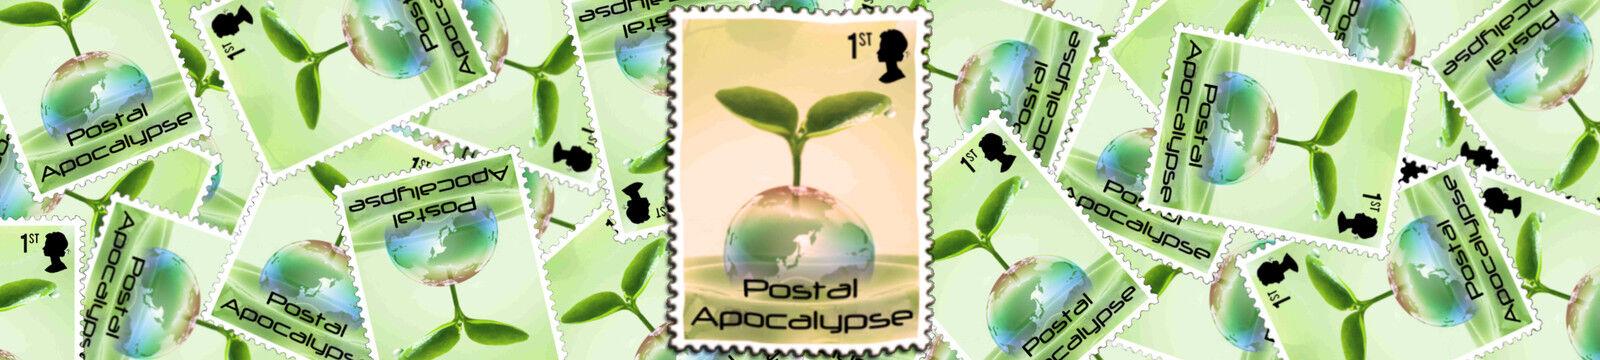 Postal-Apocalypse